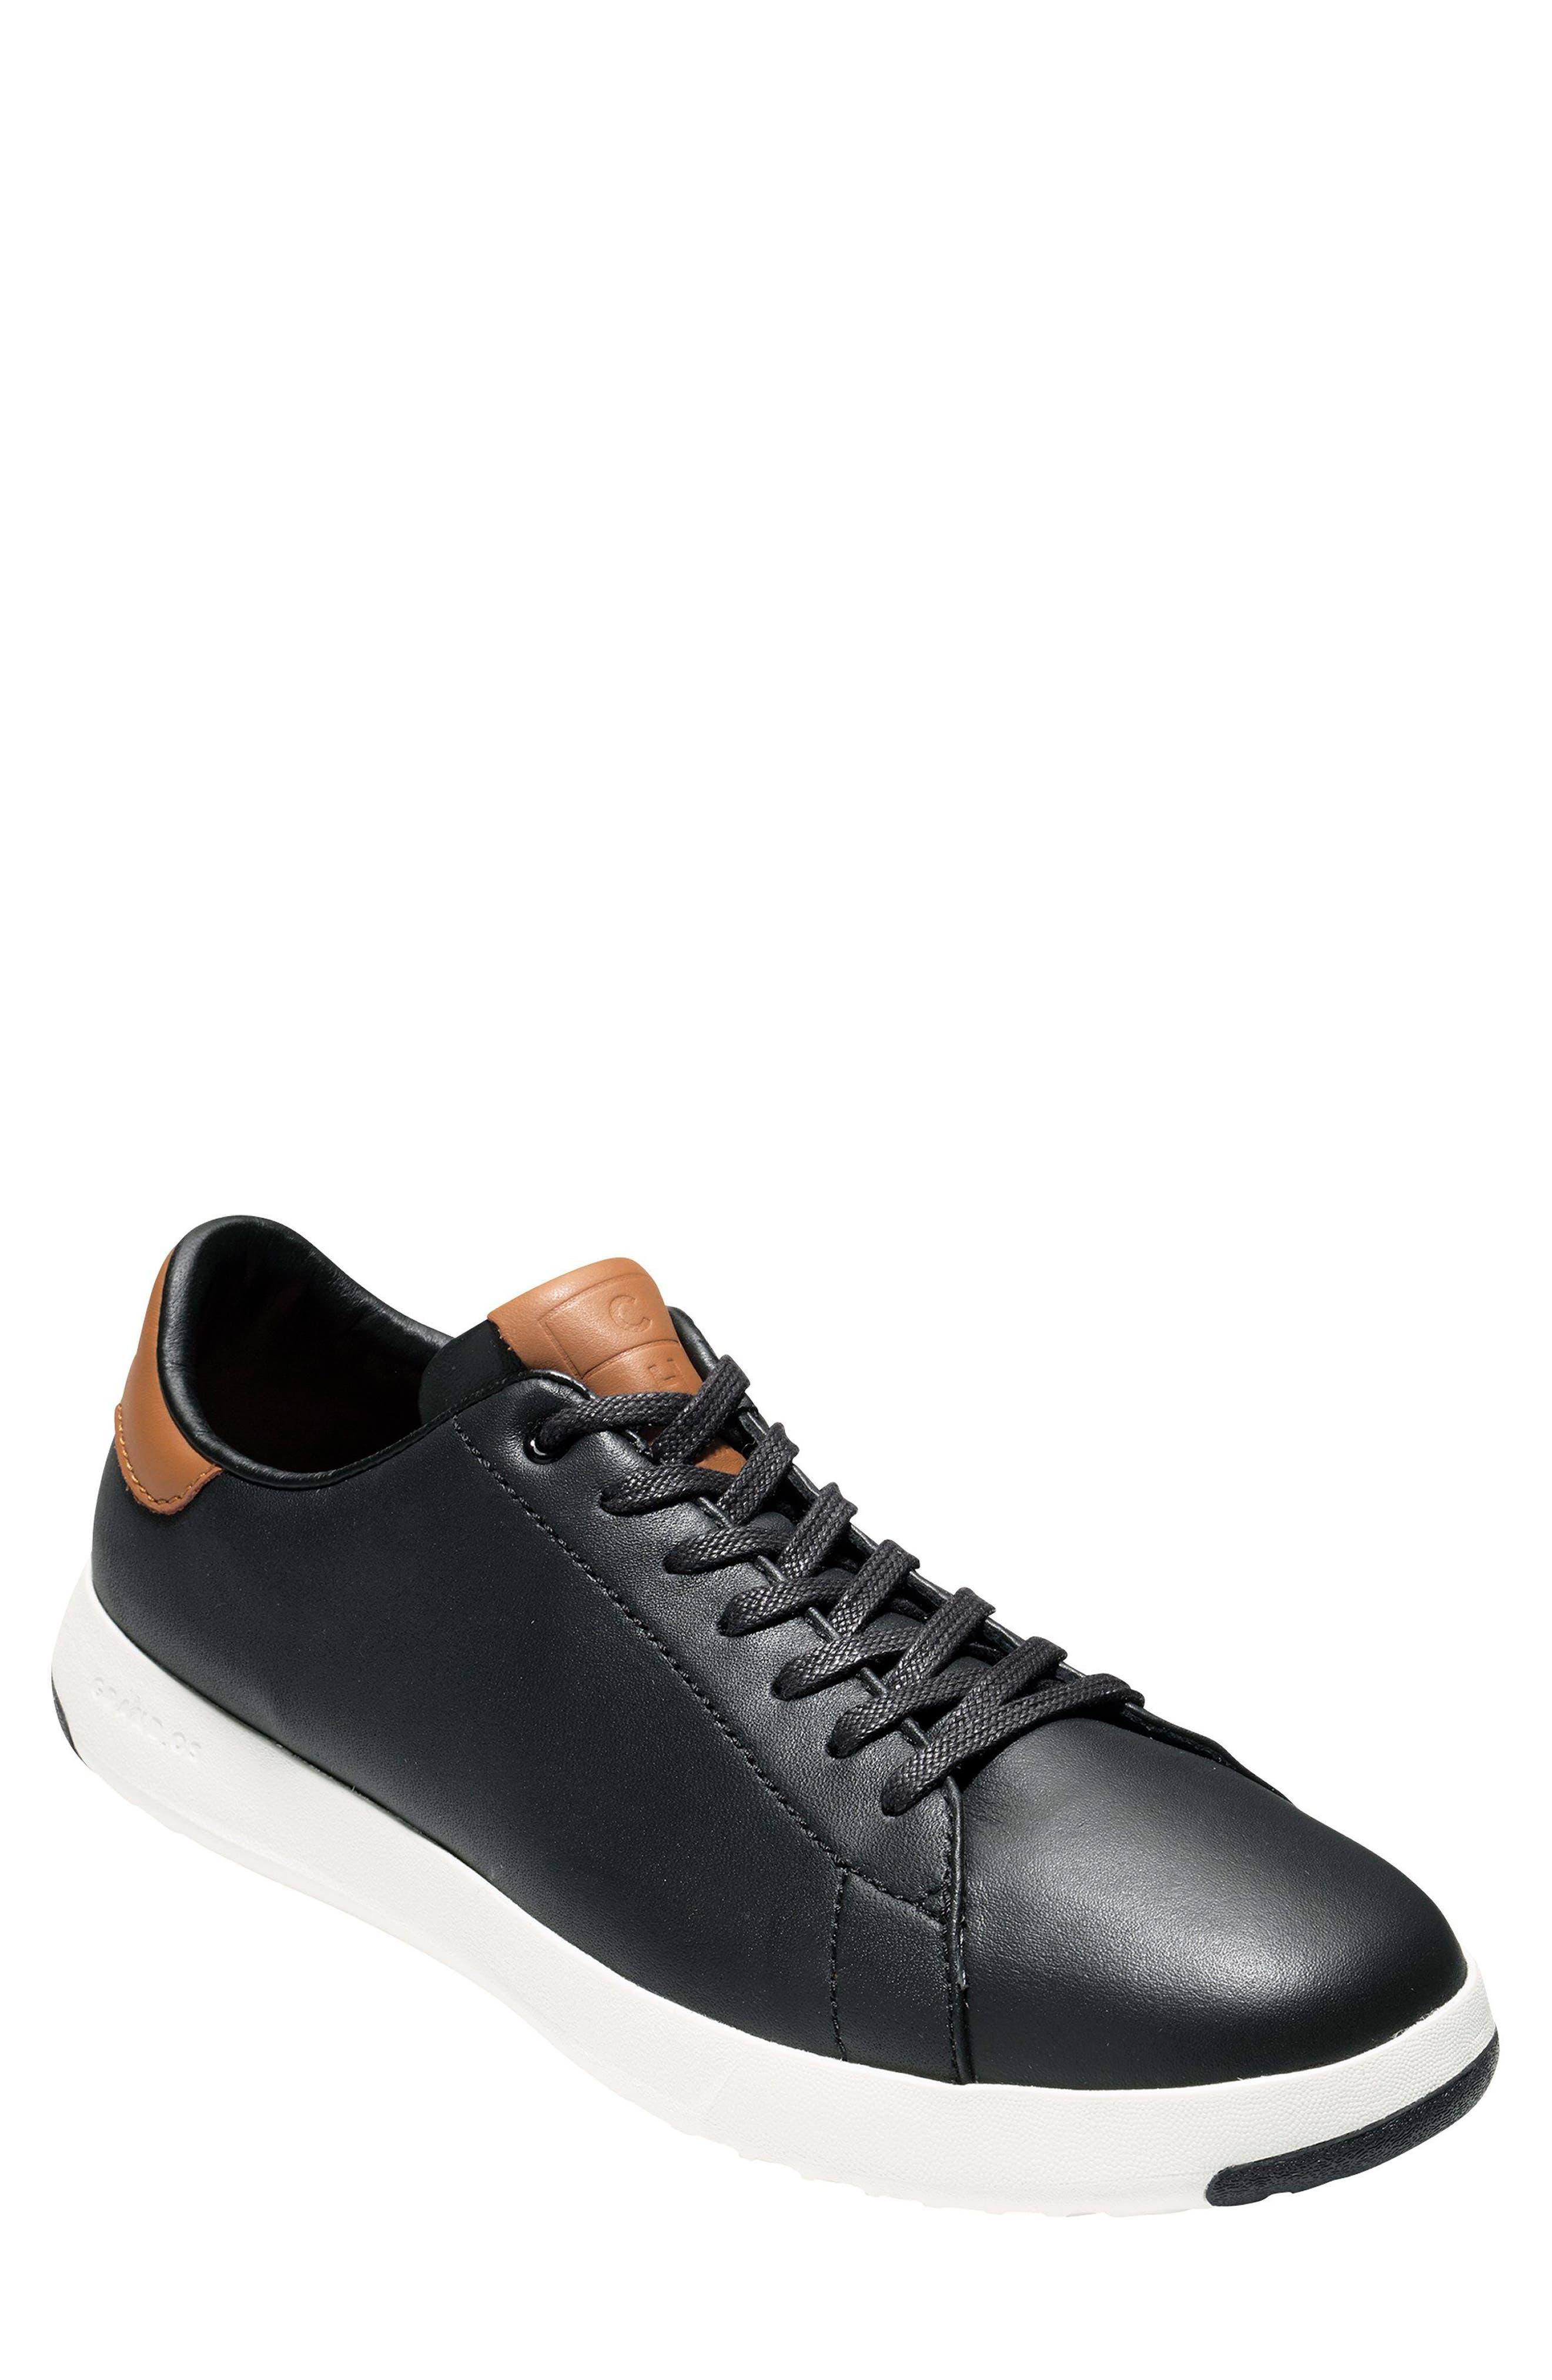 COLE HAAN, GrandPro Tennis Sneaker, Main thumbnail 1, color, BLACK/ BRITISH TAN